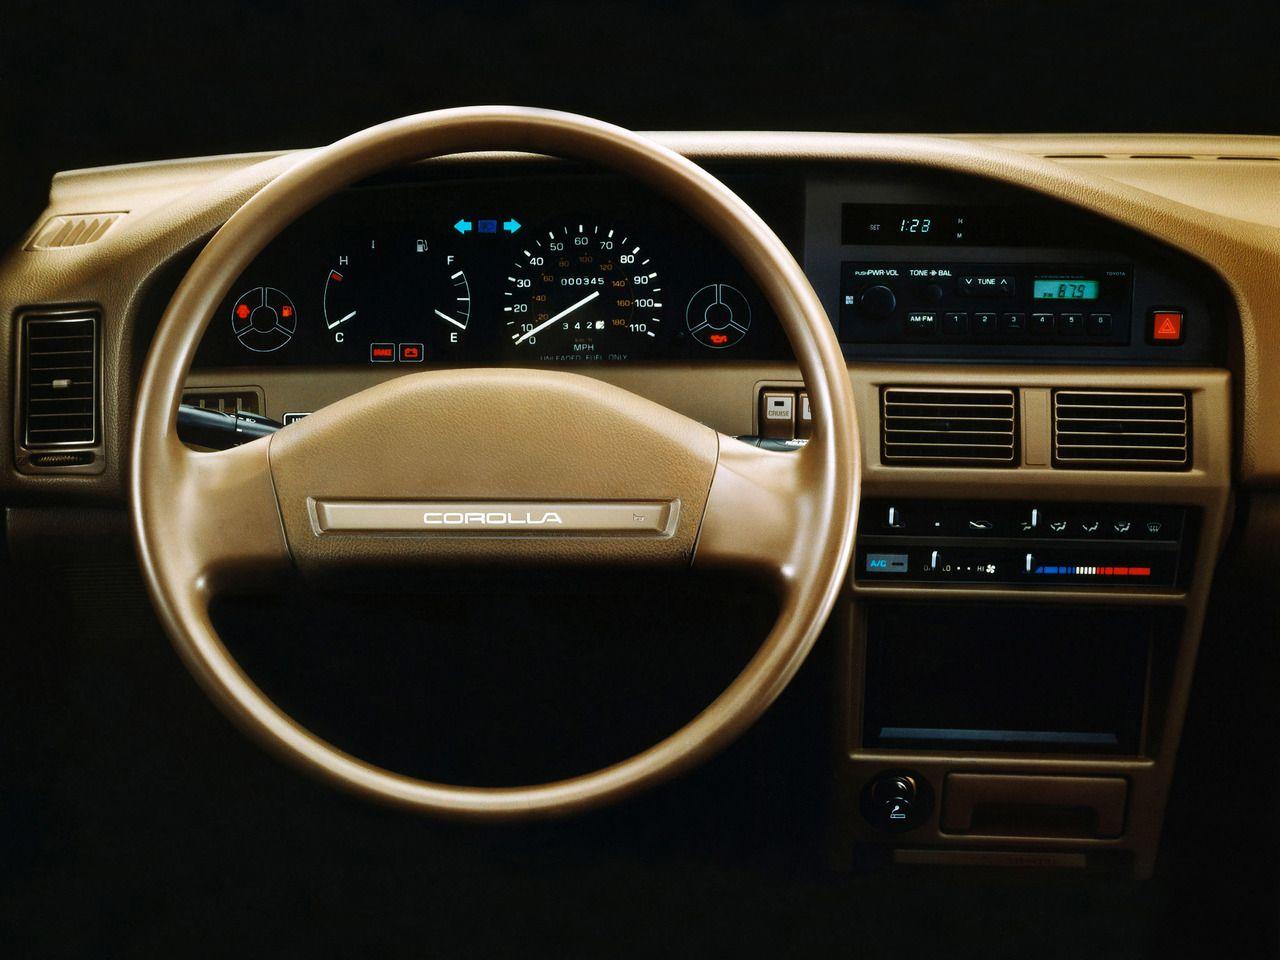 modified toyota tazz interior dashboard wiring library1987 toyota corolla sedan deluxe corolla car, toyota corolla, toyota canada, dashboard car